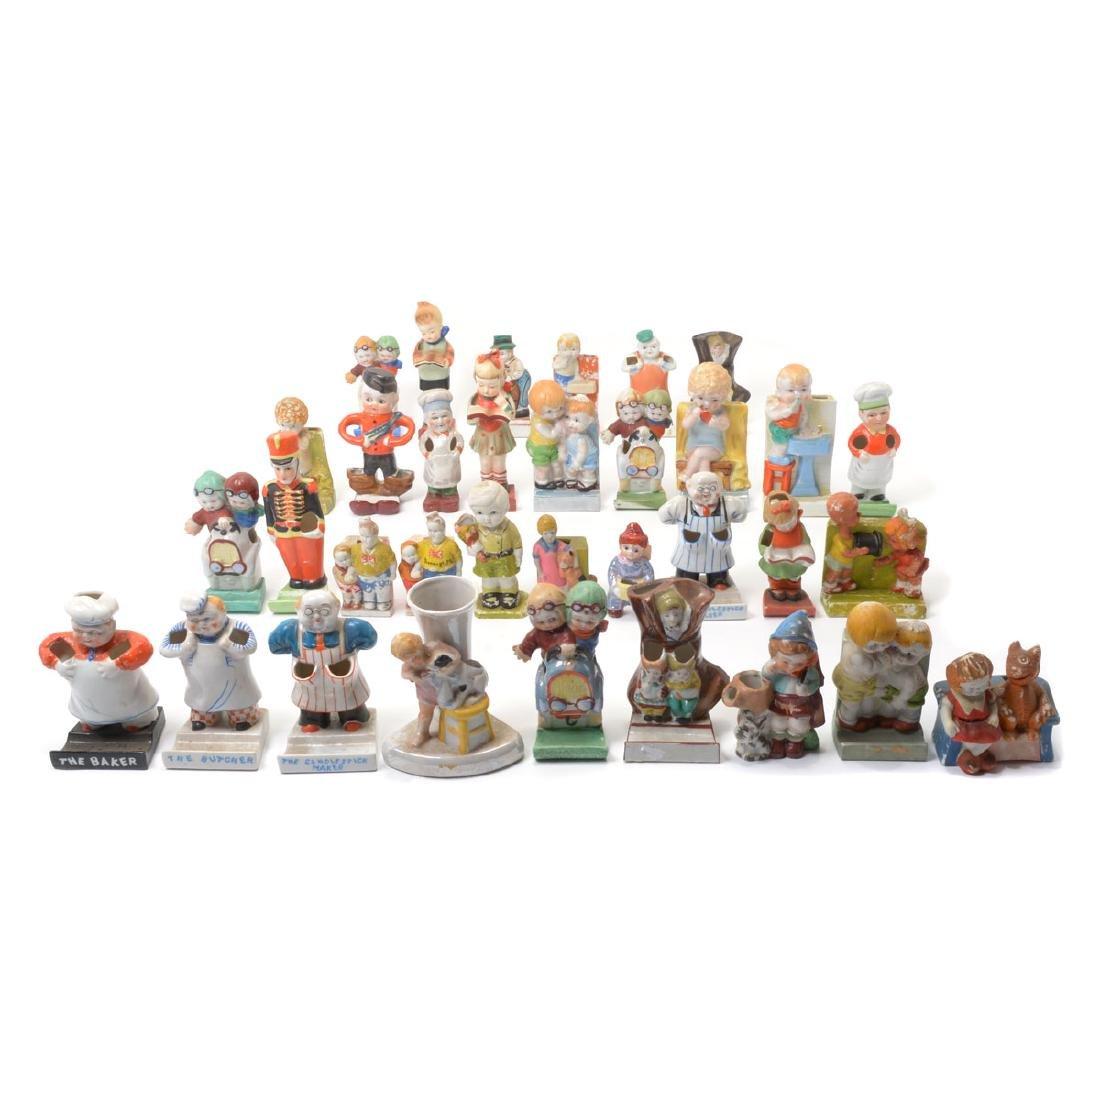 Group of Vintage Ceramic Figural Toothbrush Holders